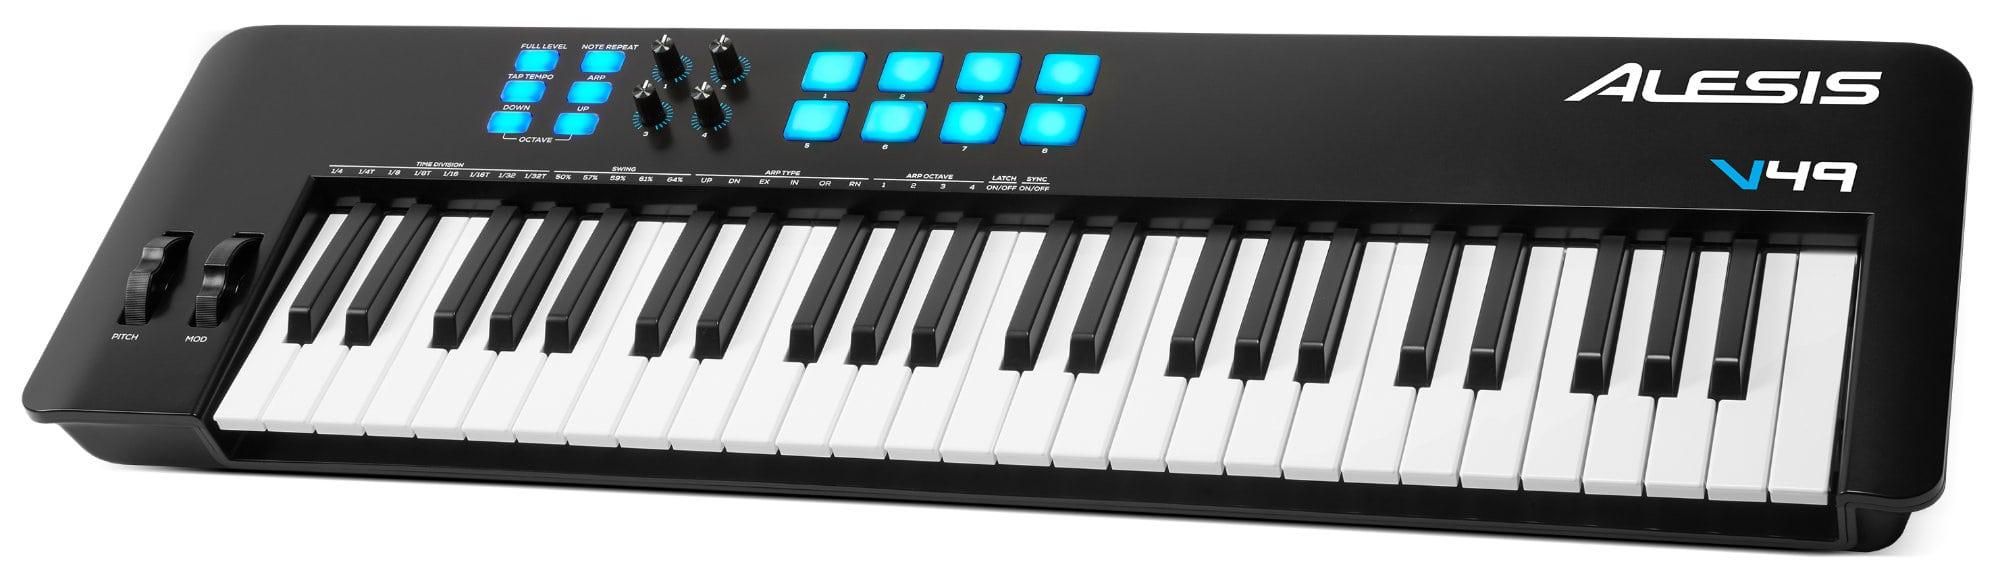 Midimasterkeyboards - Alesis V49 MKII MIDI Controller Keyboard - Onlineshop Musikhaus Kirstein